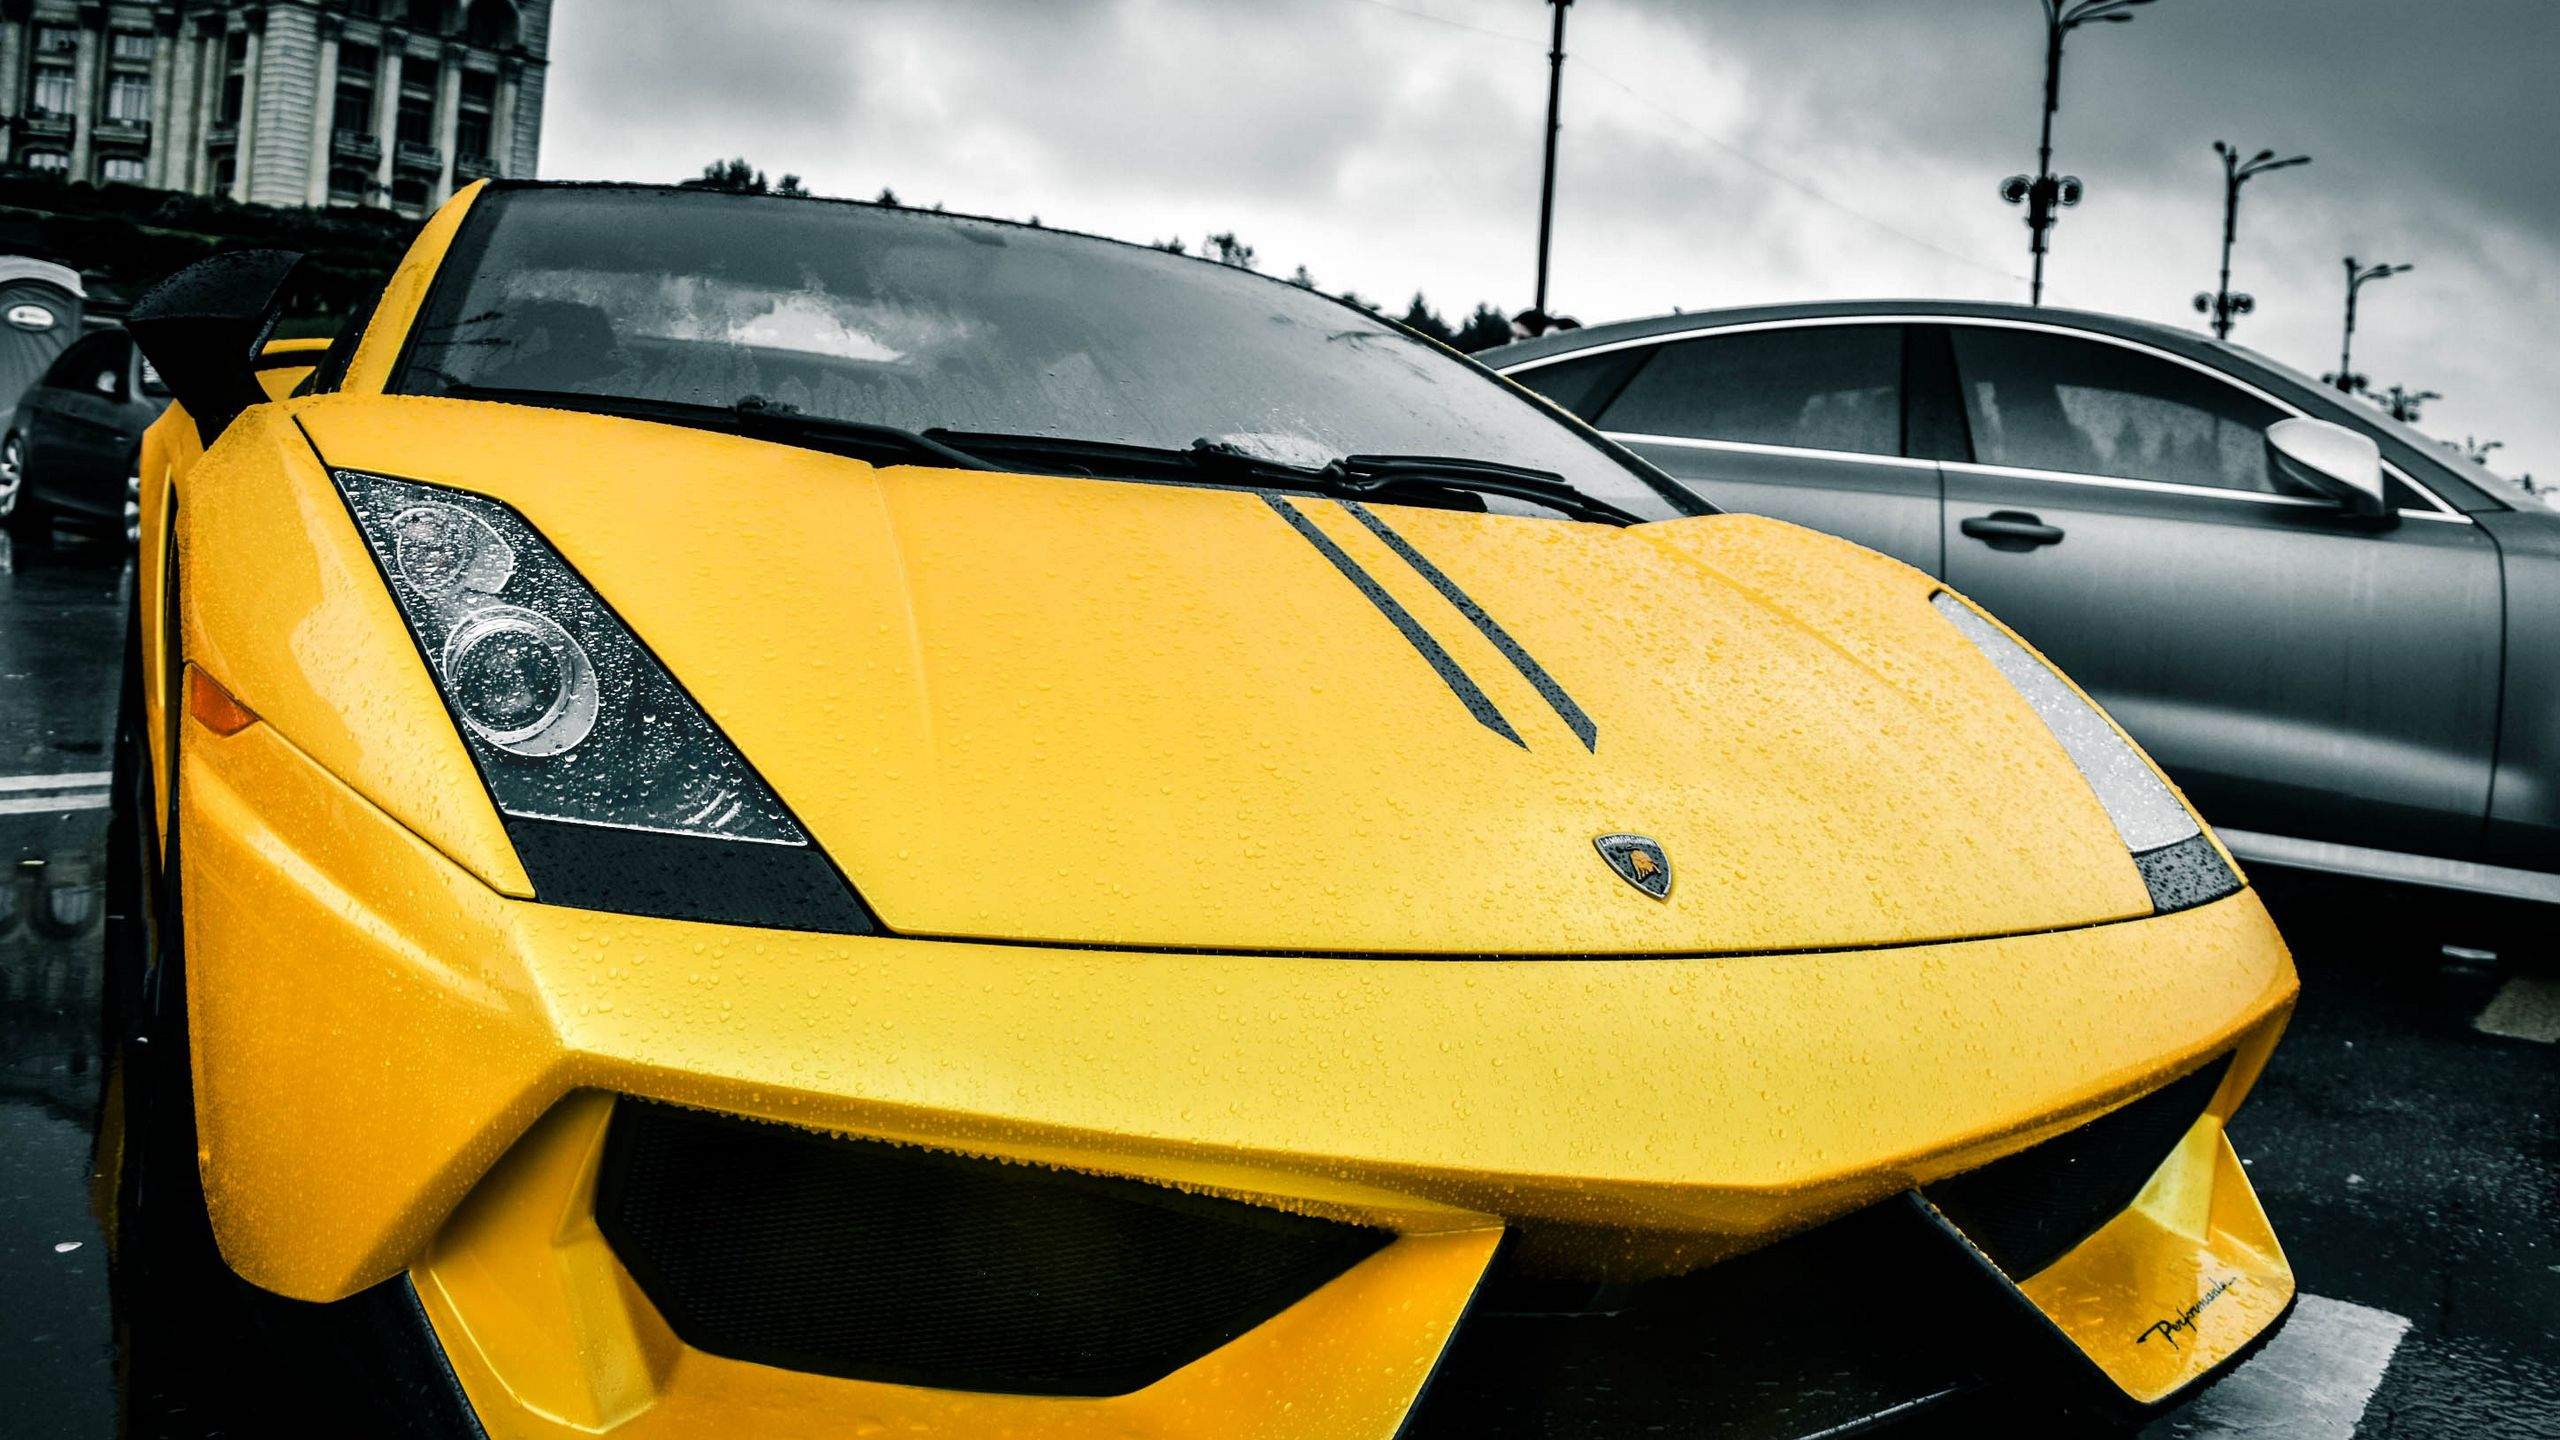 2560x1440 Wallpaper lamborghini, yellow, rain, street